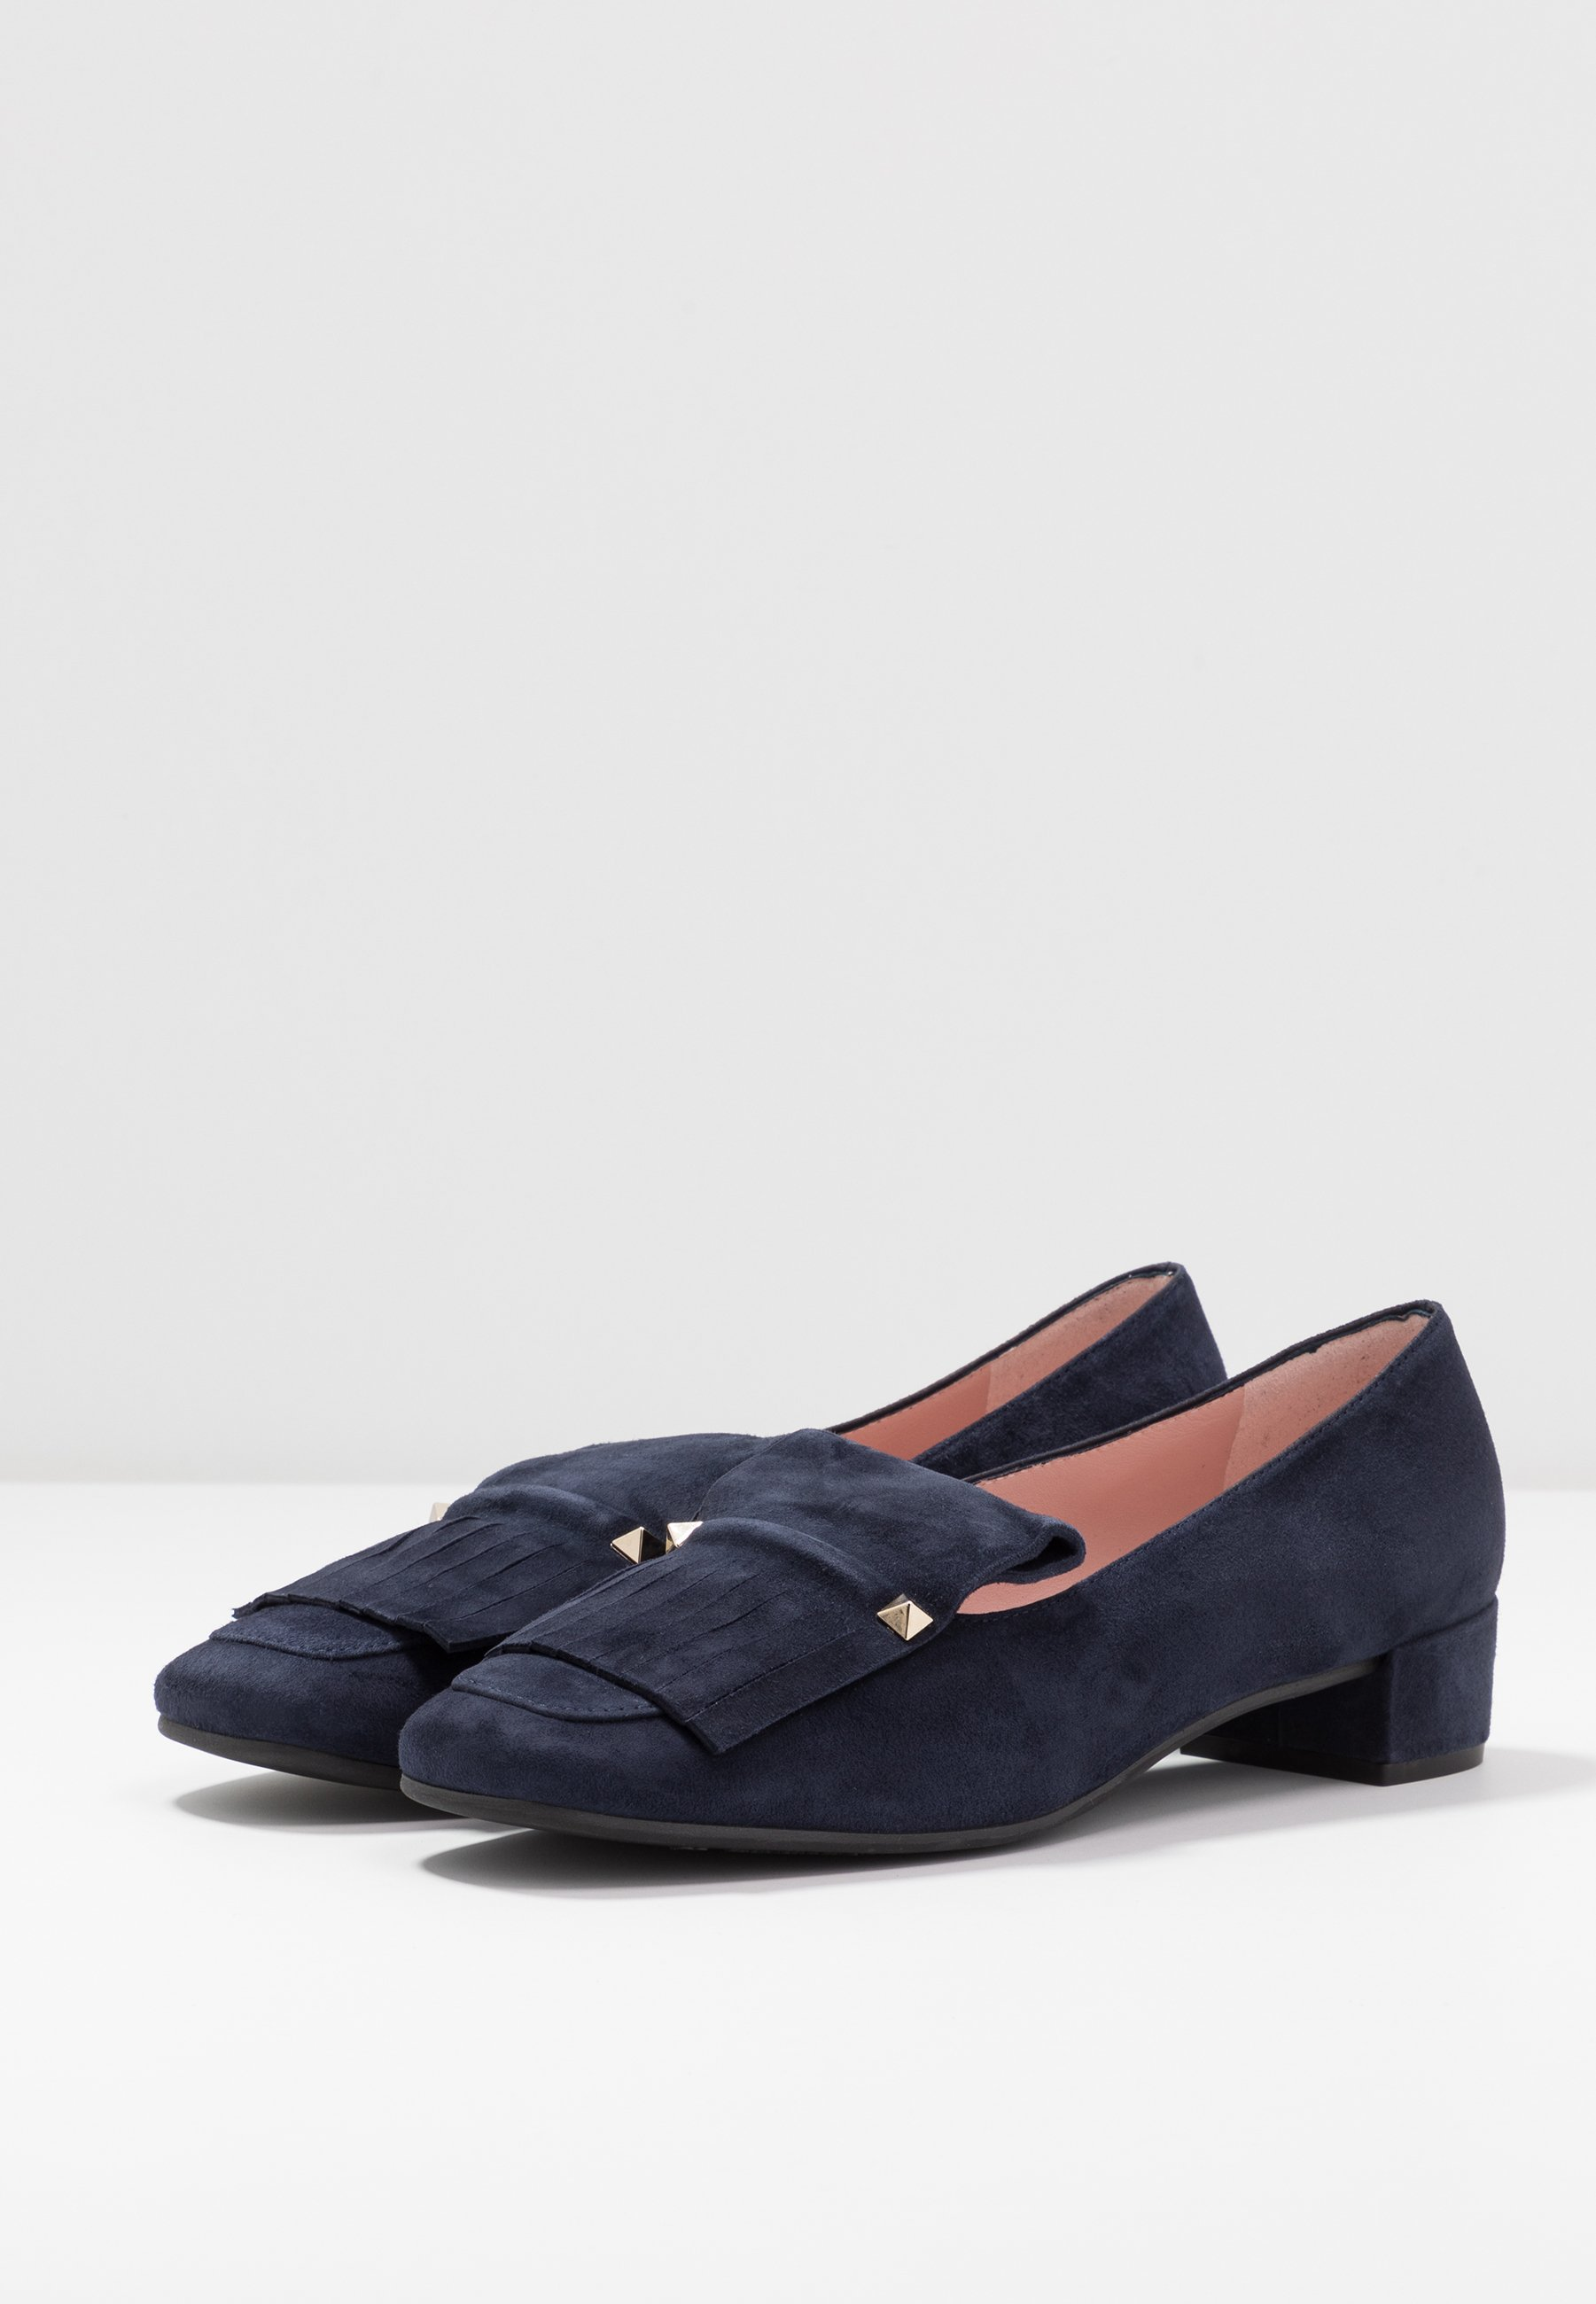 Pretty Ballerinas Angelis - Pumps Navy Blue